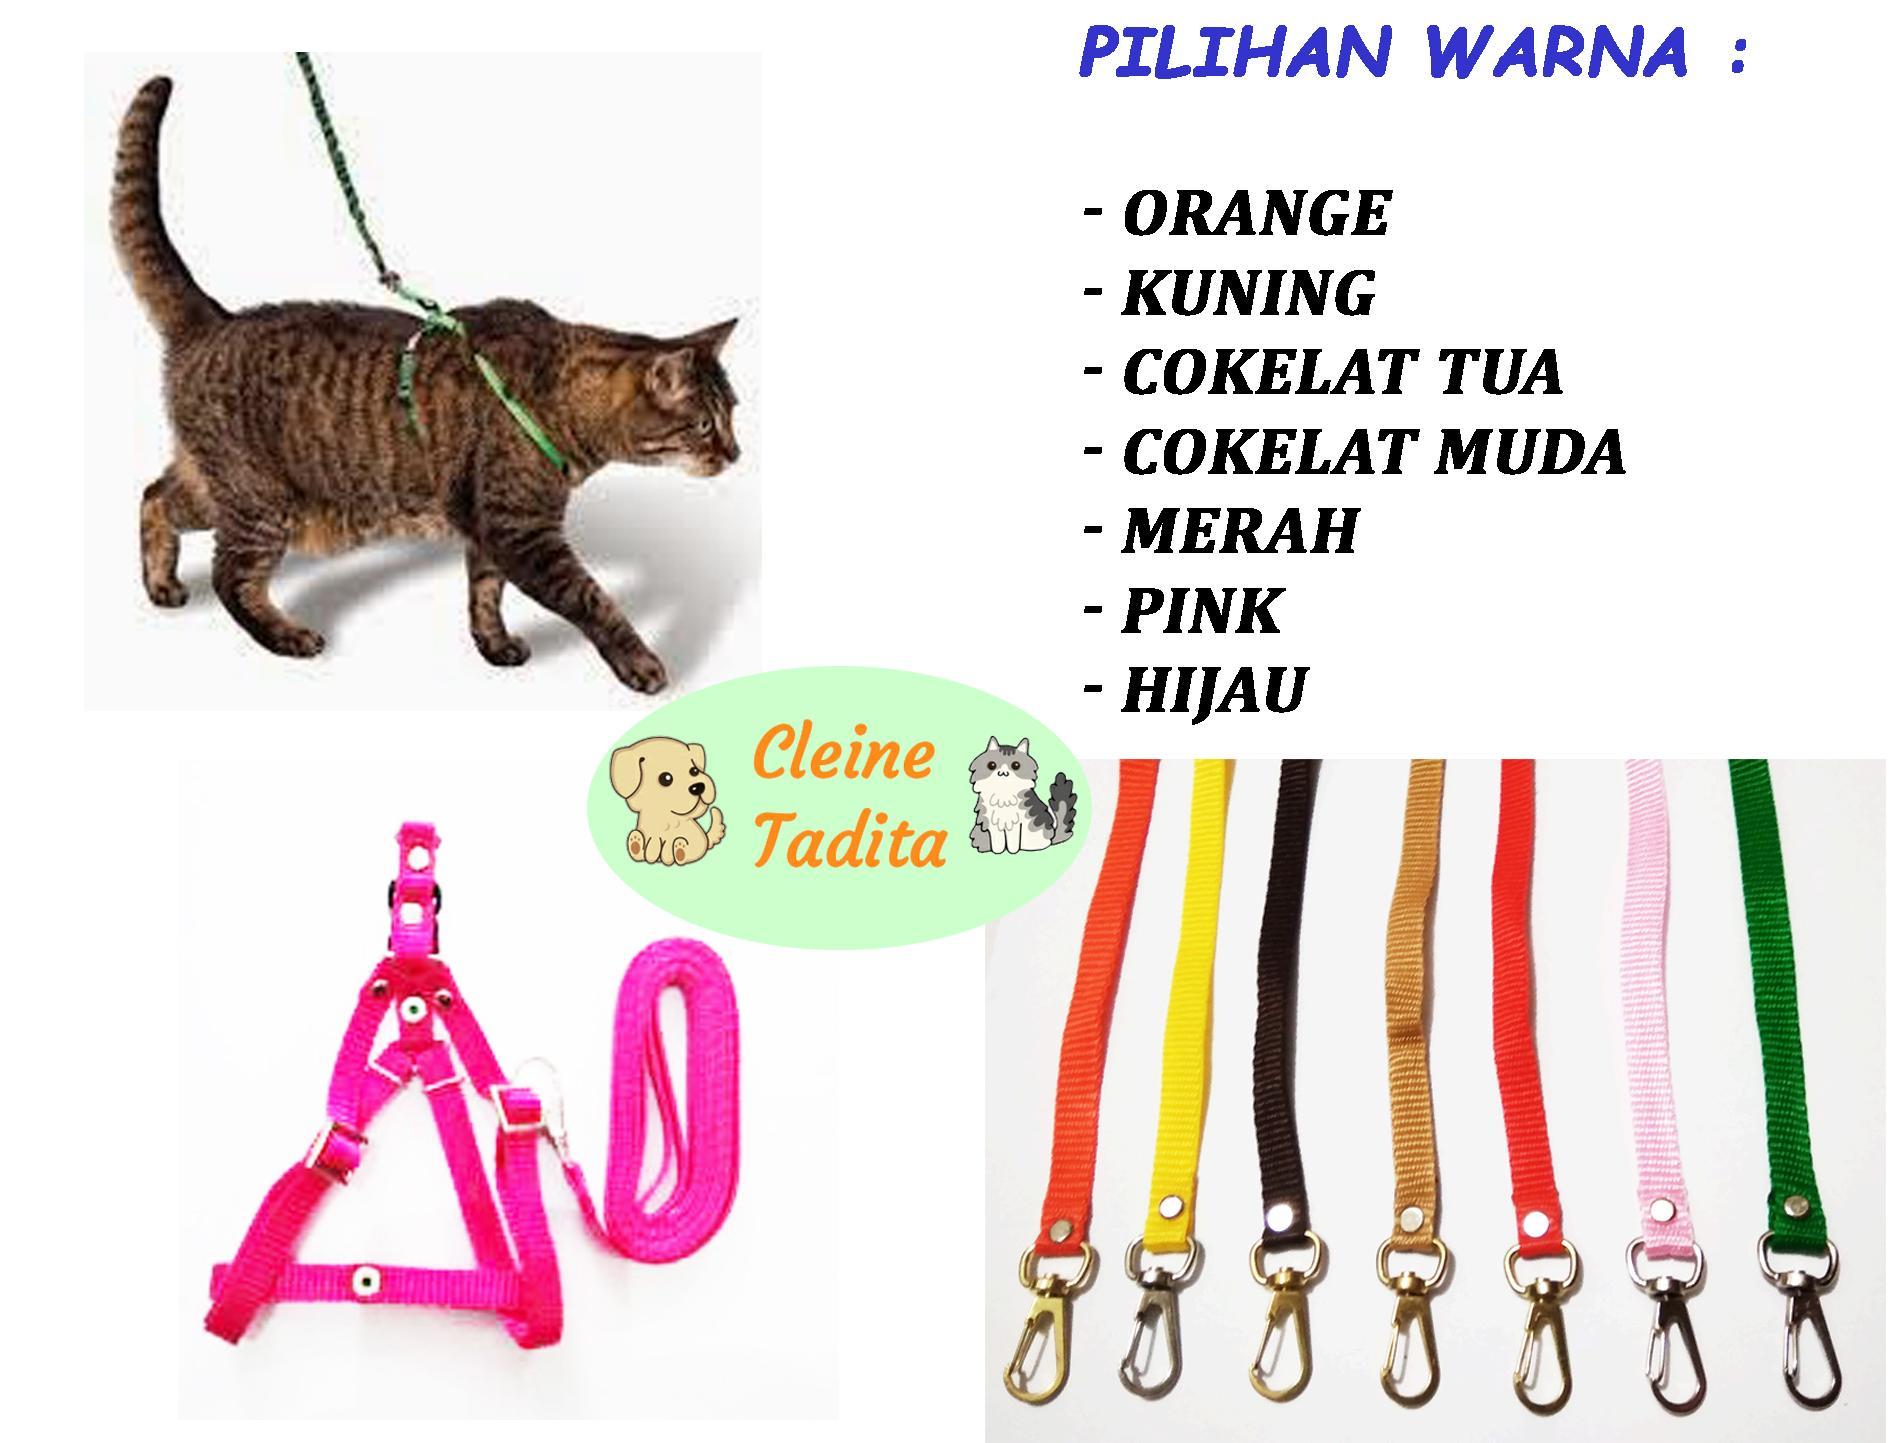 Perlengkapan Kucing Peliharaan Whiskas Dry 480gr Makanan Kering Rasa Tuna Cleine Tadita Petshop Tali Tuntun Harnes Dan Anjing